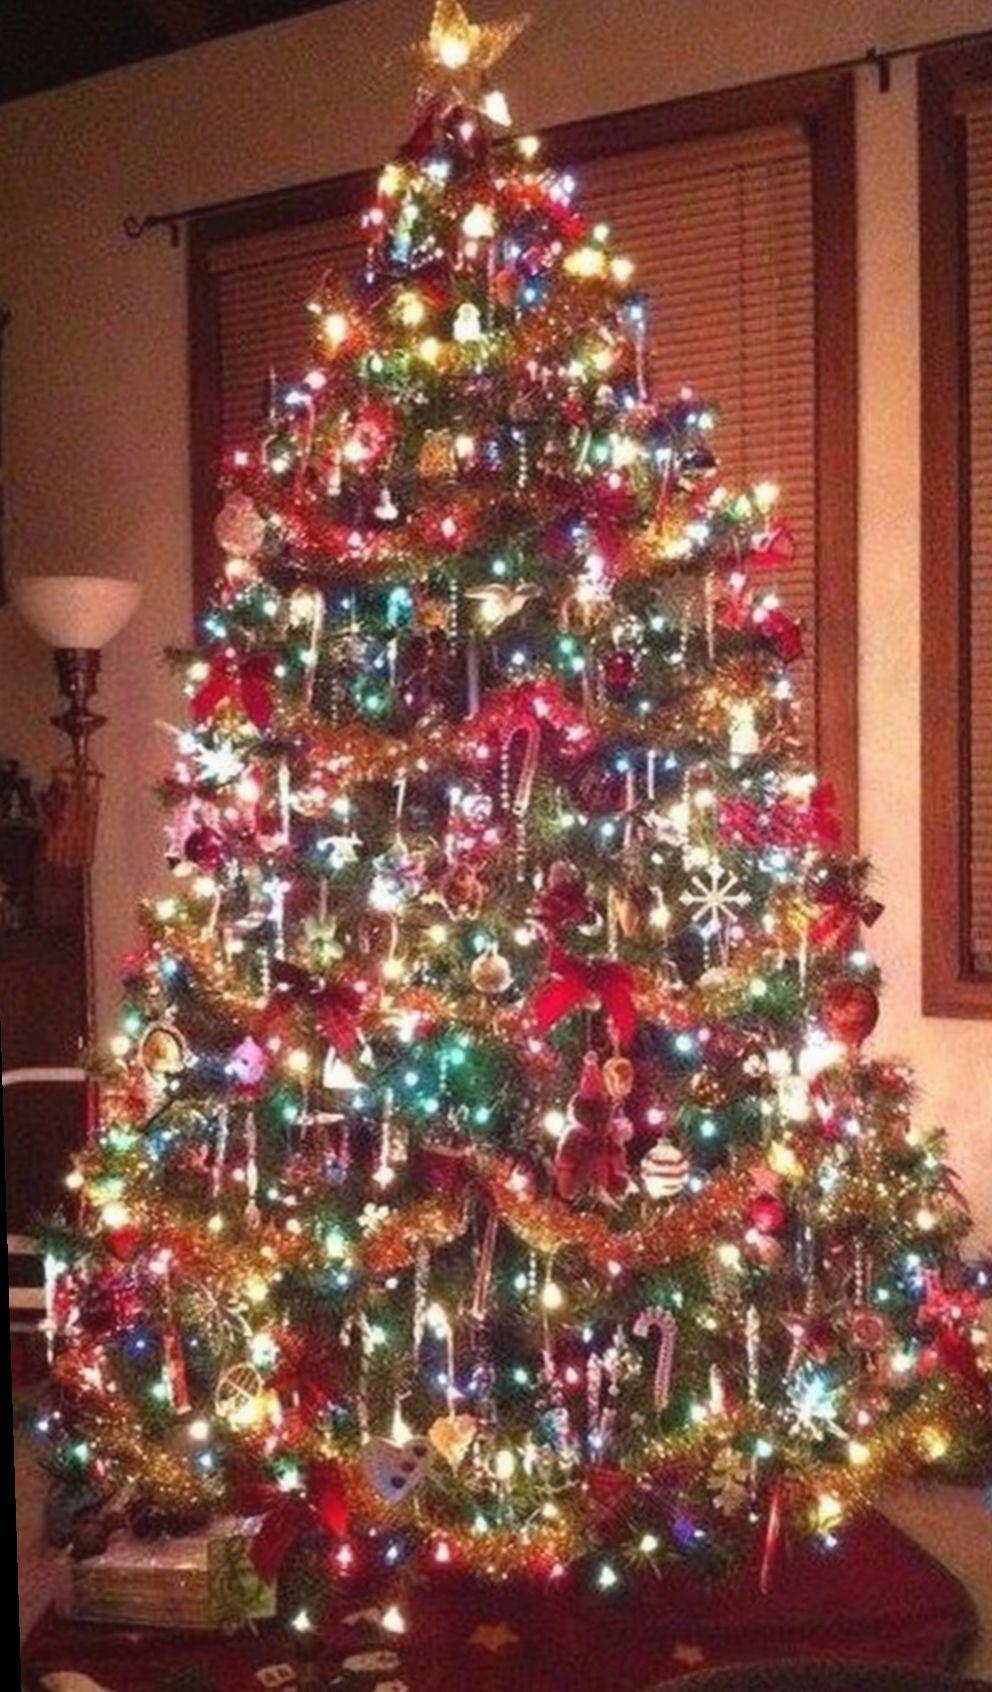 7 Christmas Lights Vintage Decorating Ideas Christmas Lights In 2020 Christmas Lights Xmas Tree Decorations Outdoor Christmas Decorations